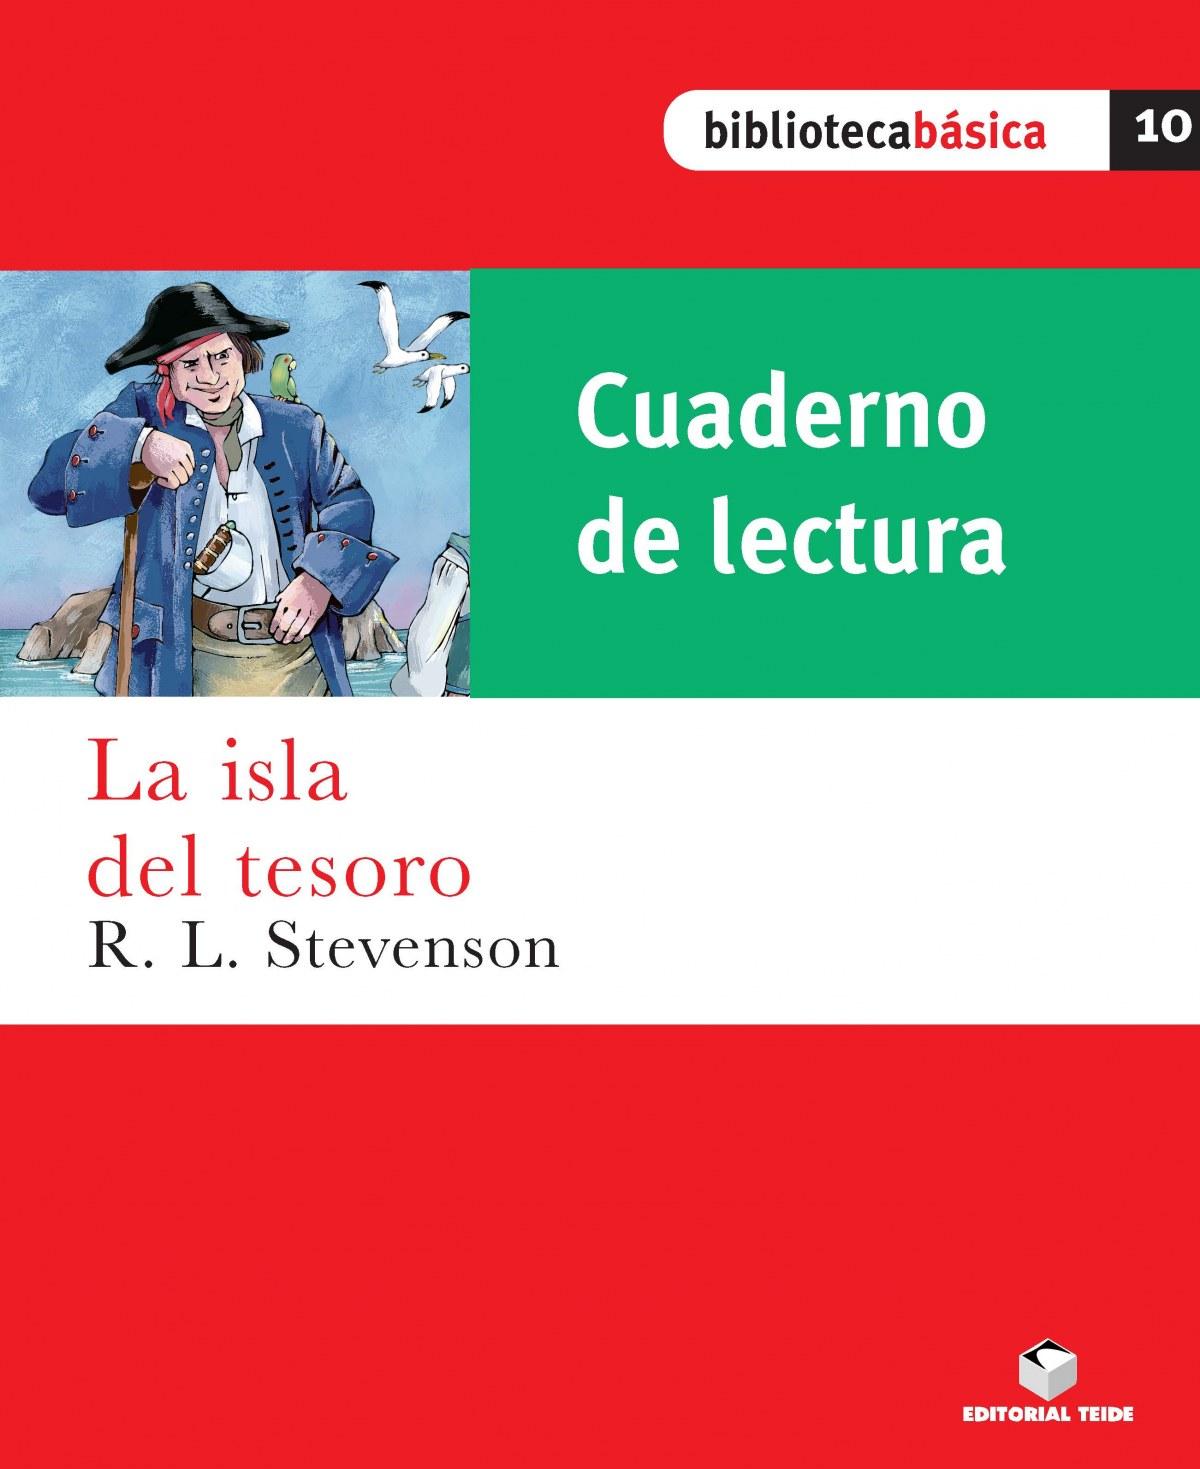 Cuaderno lectura isla tesoro - Desconocido